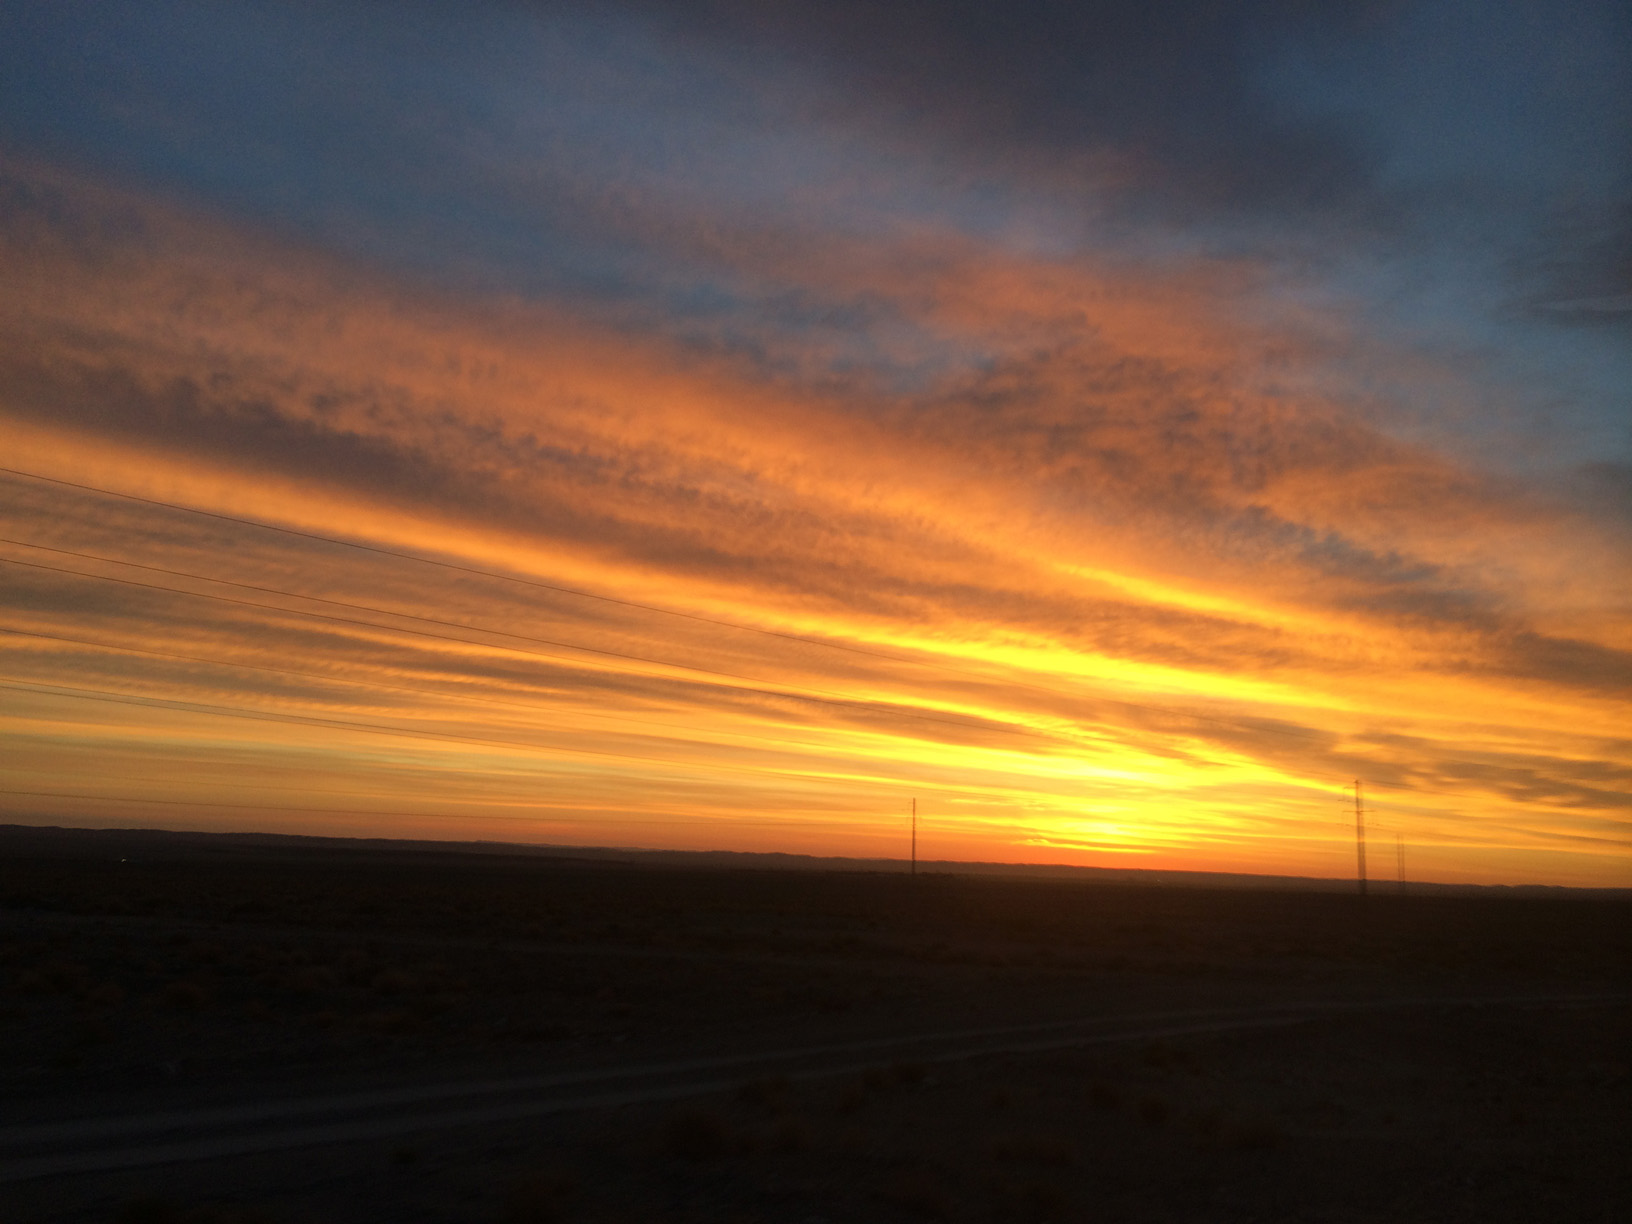 sunset in the gobi